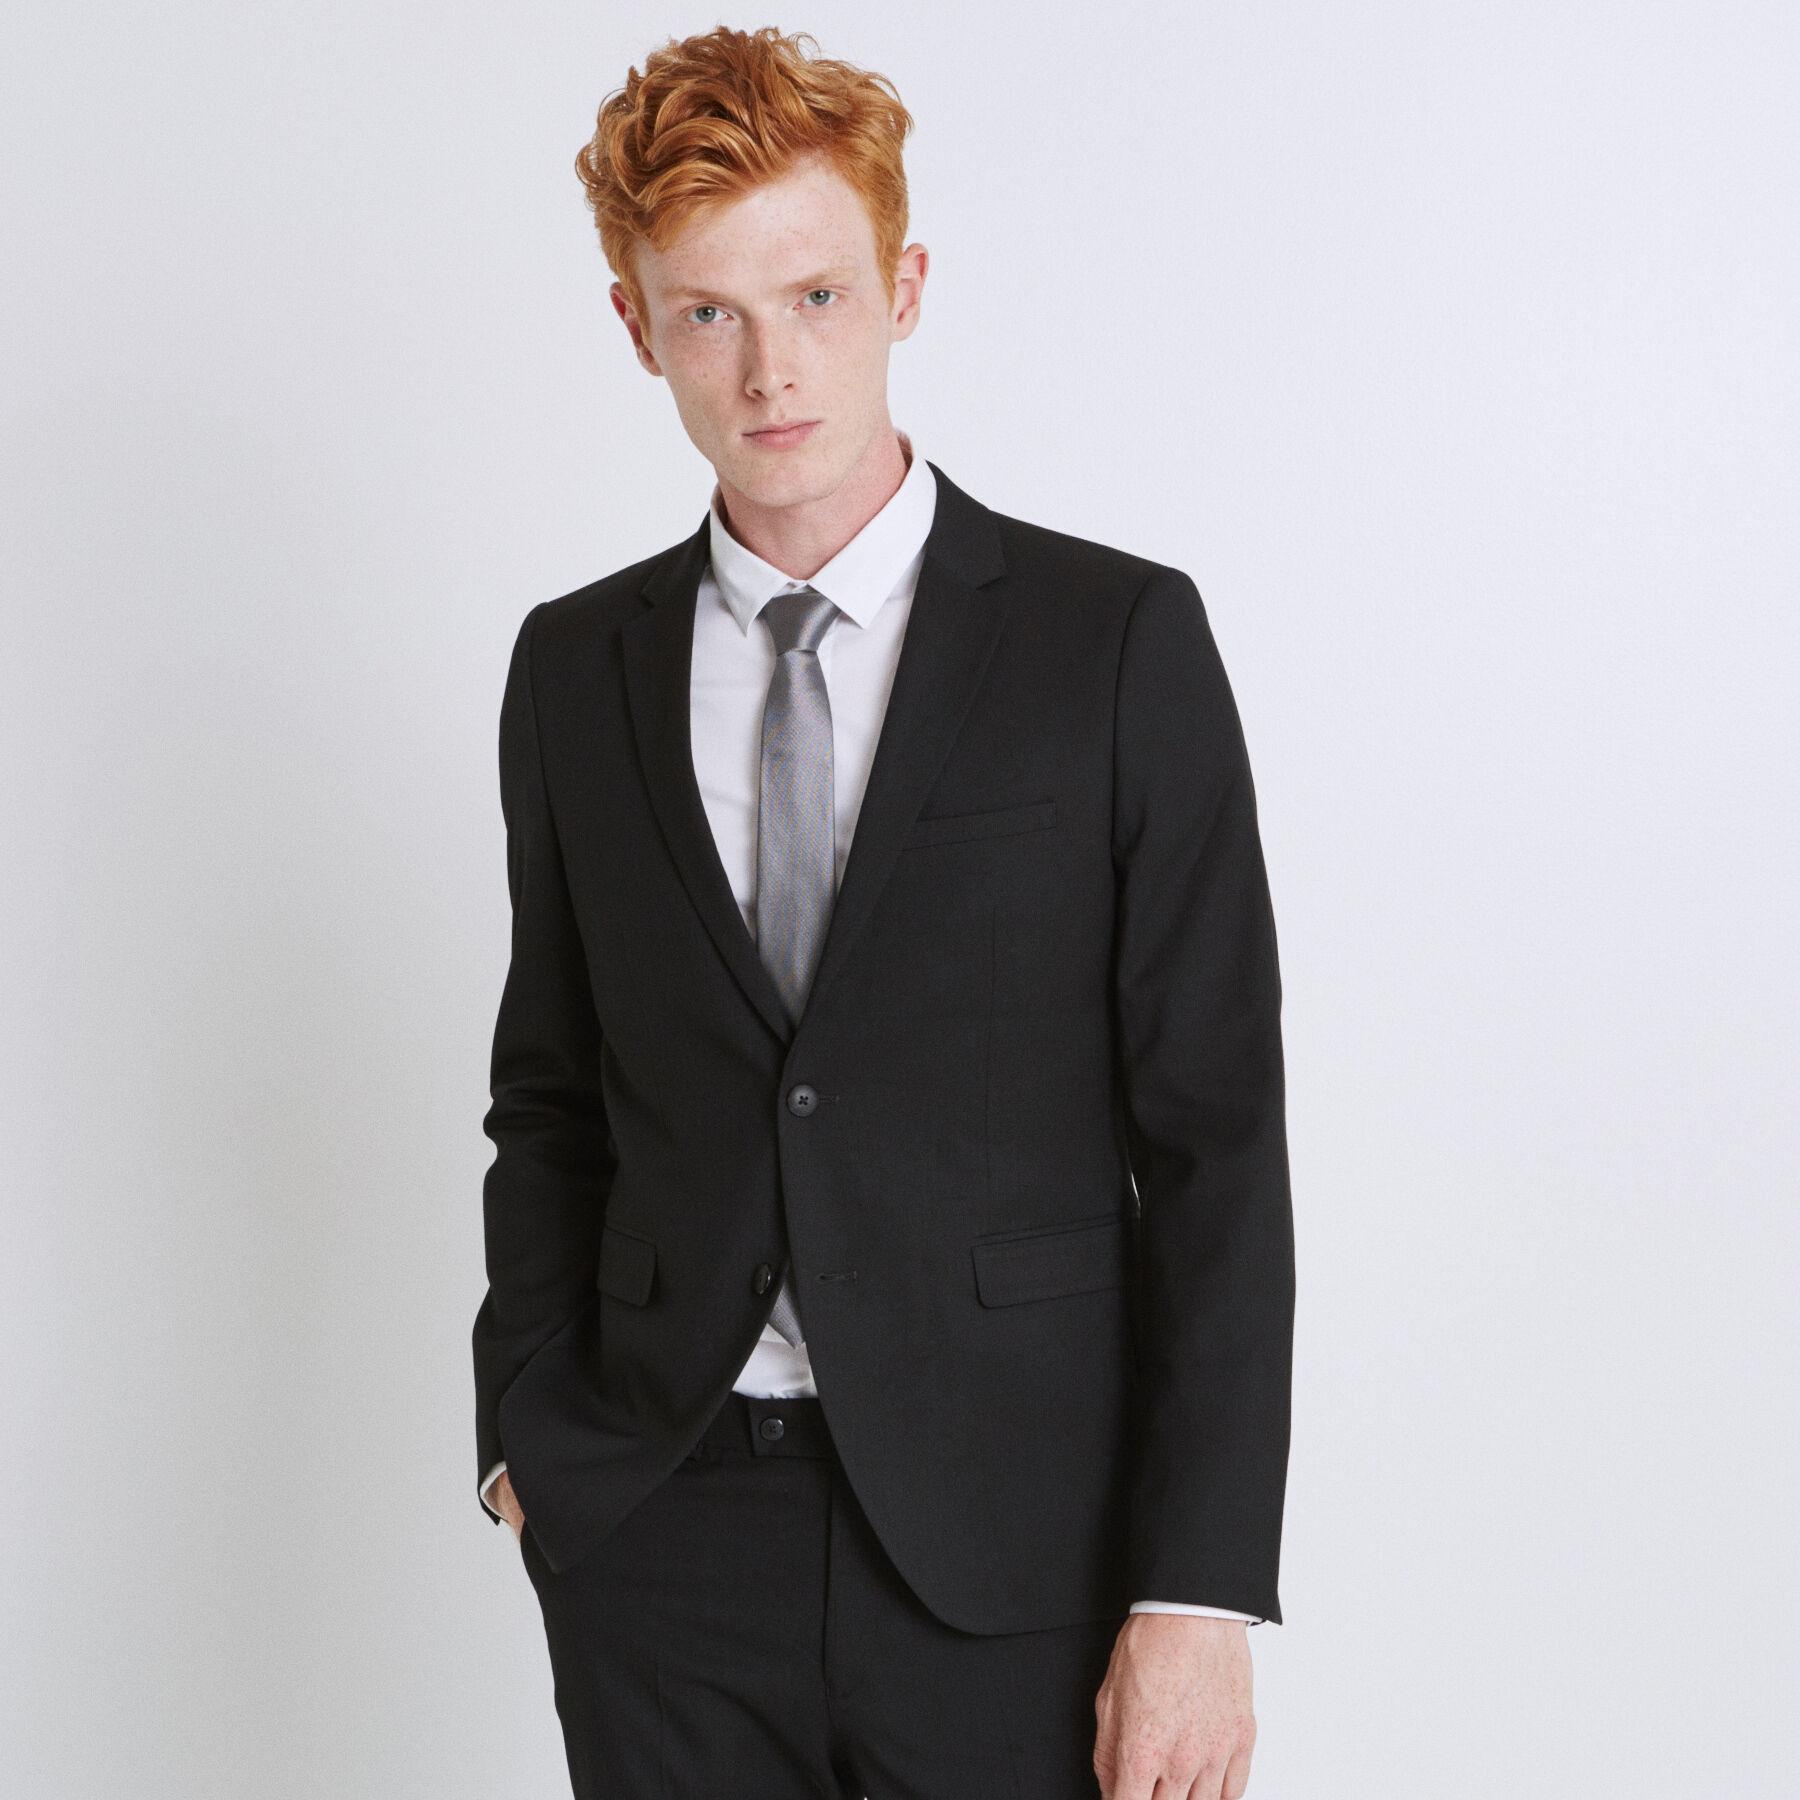 Veste Pantalon Blazer Homme Costume Jules 5xRXwn